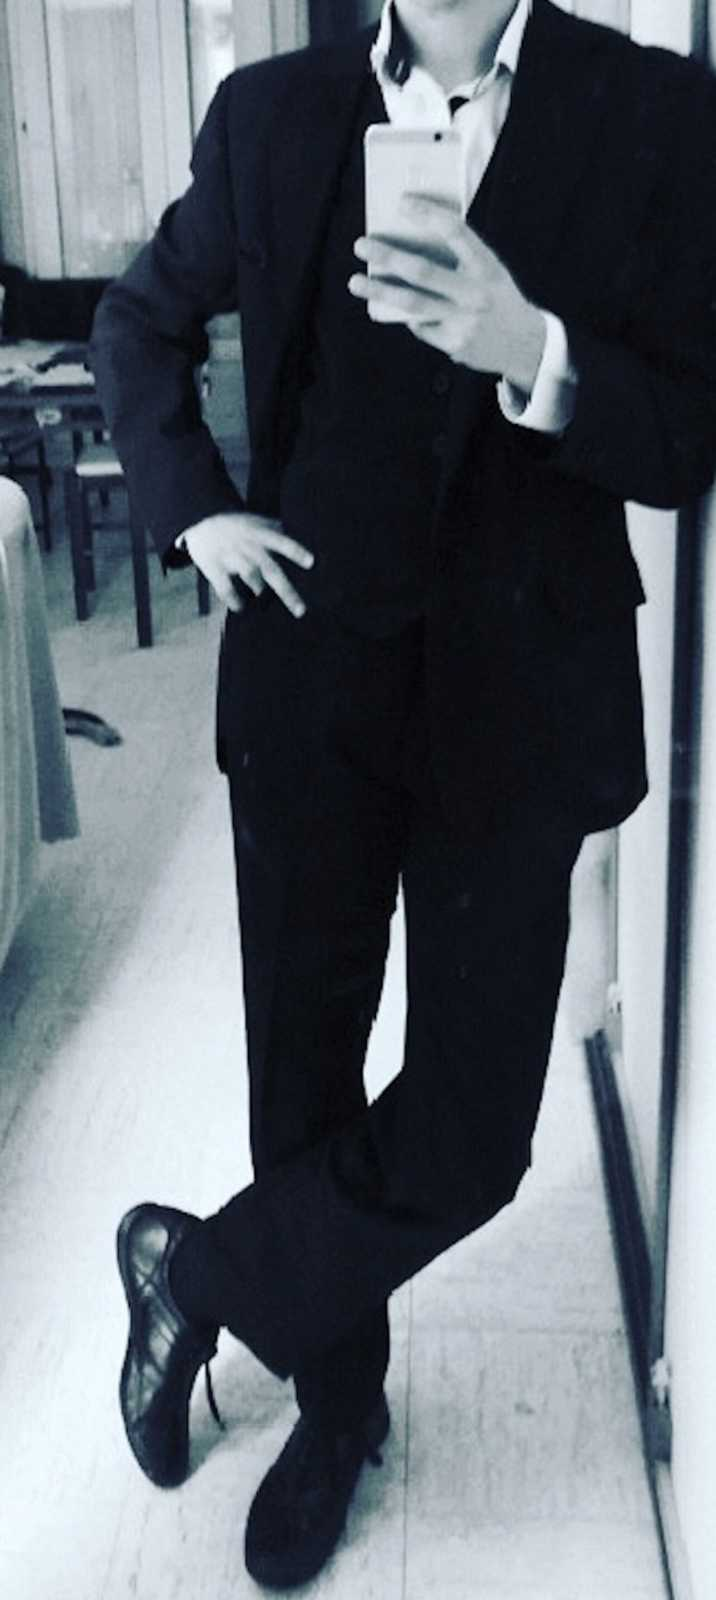 transgender woman in a suit